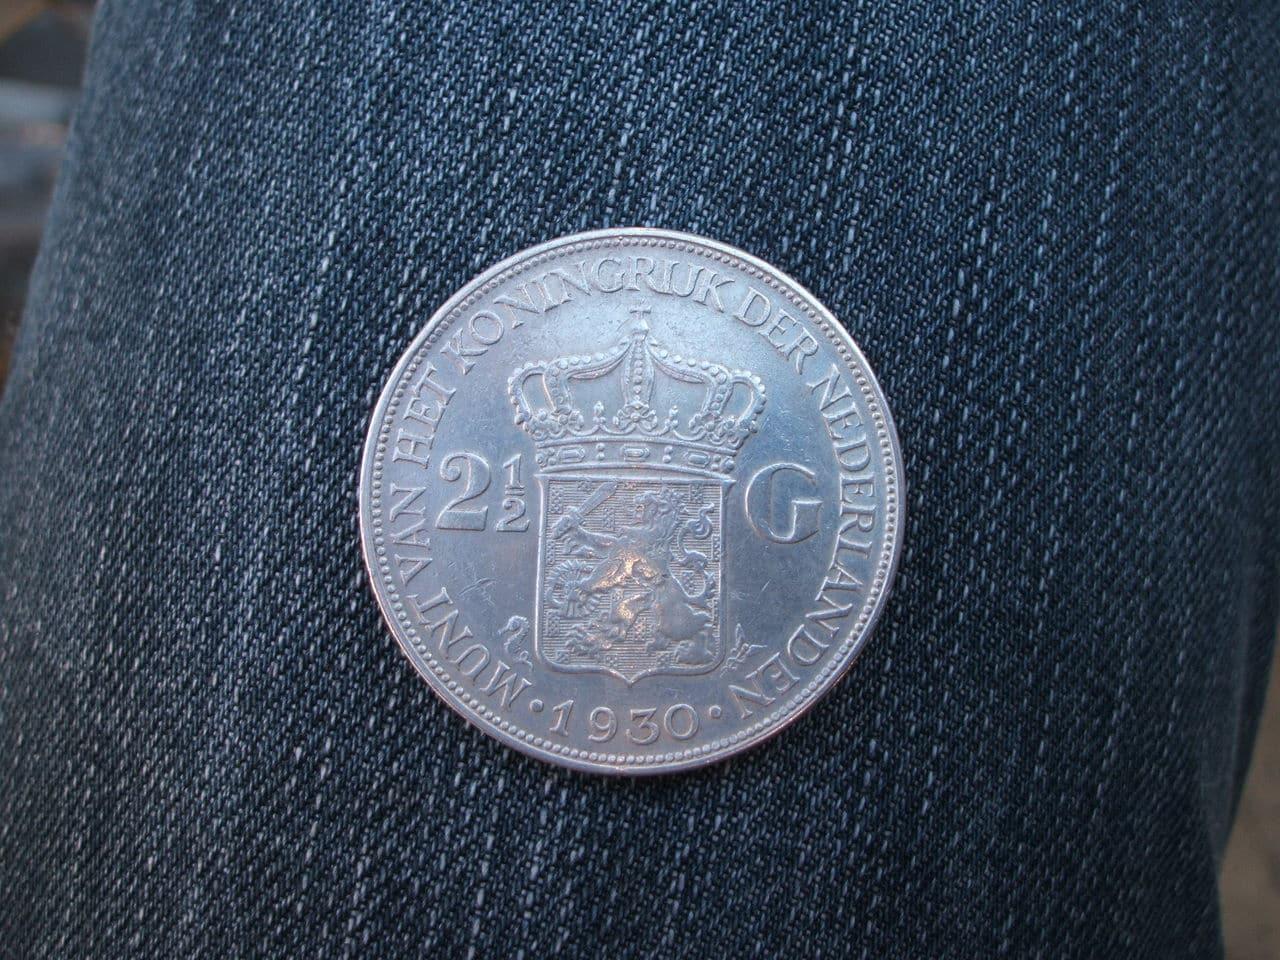 2 1/2 Gulden. Holanda. 1930  002